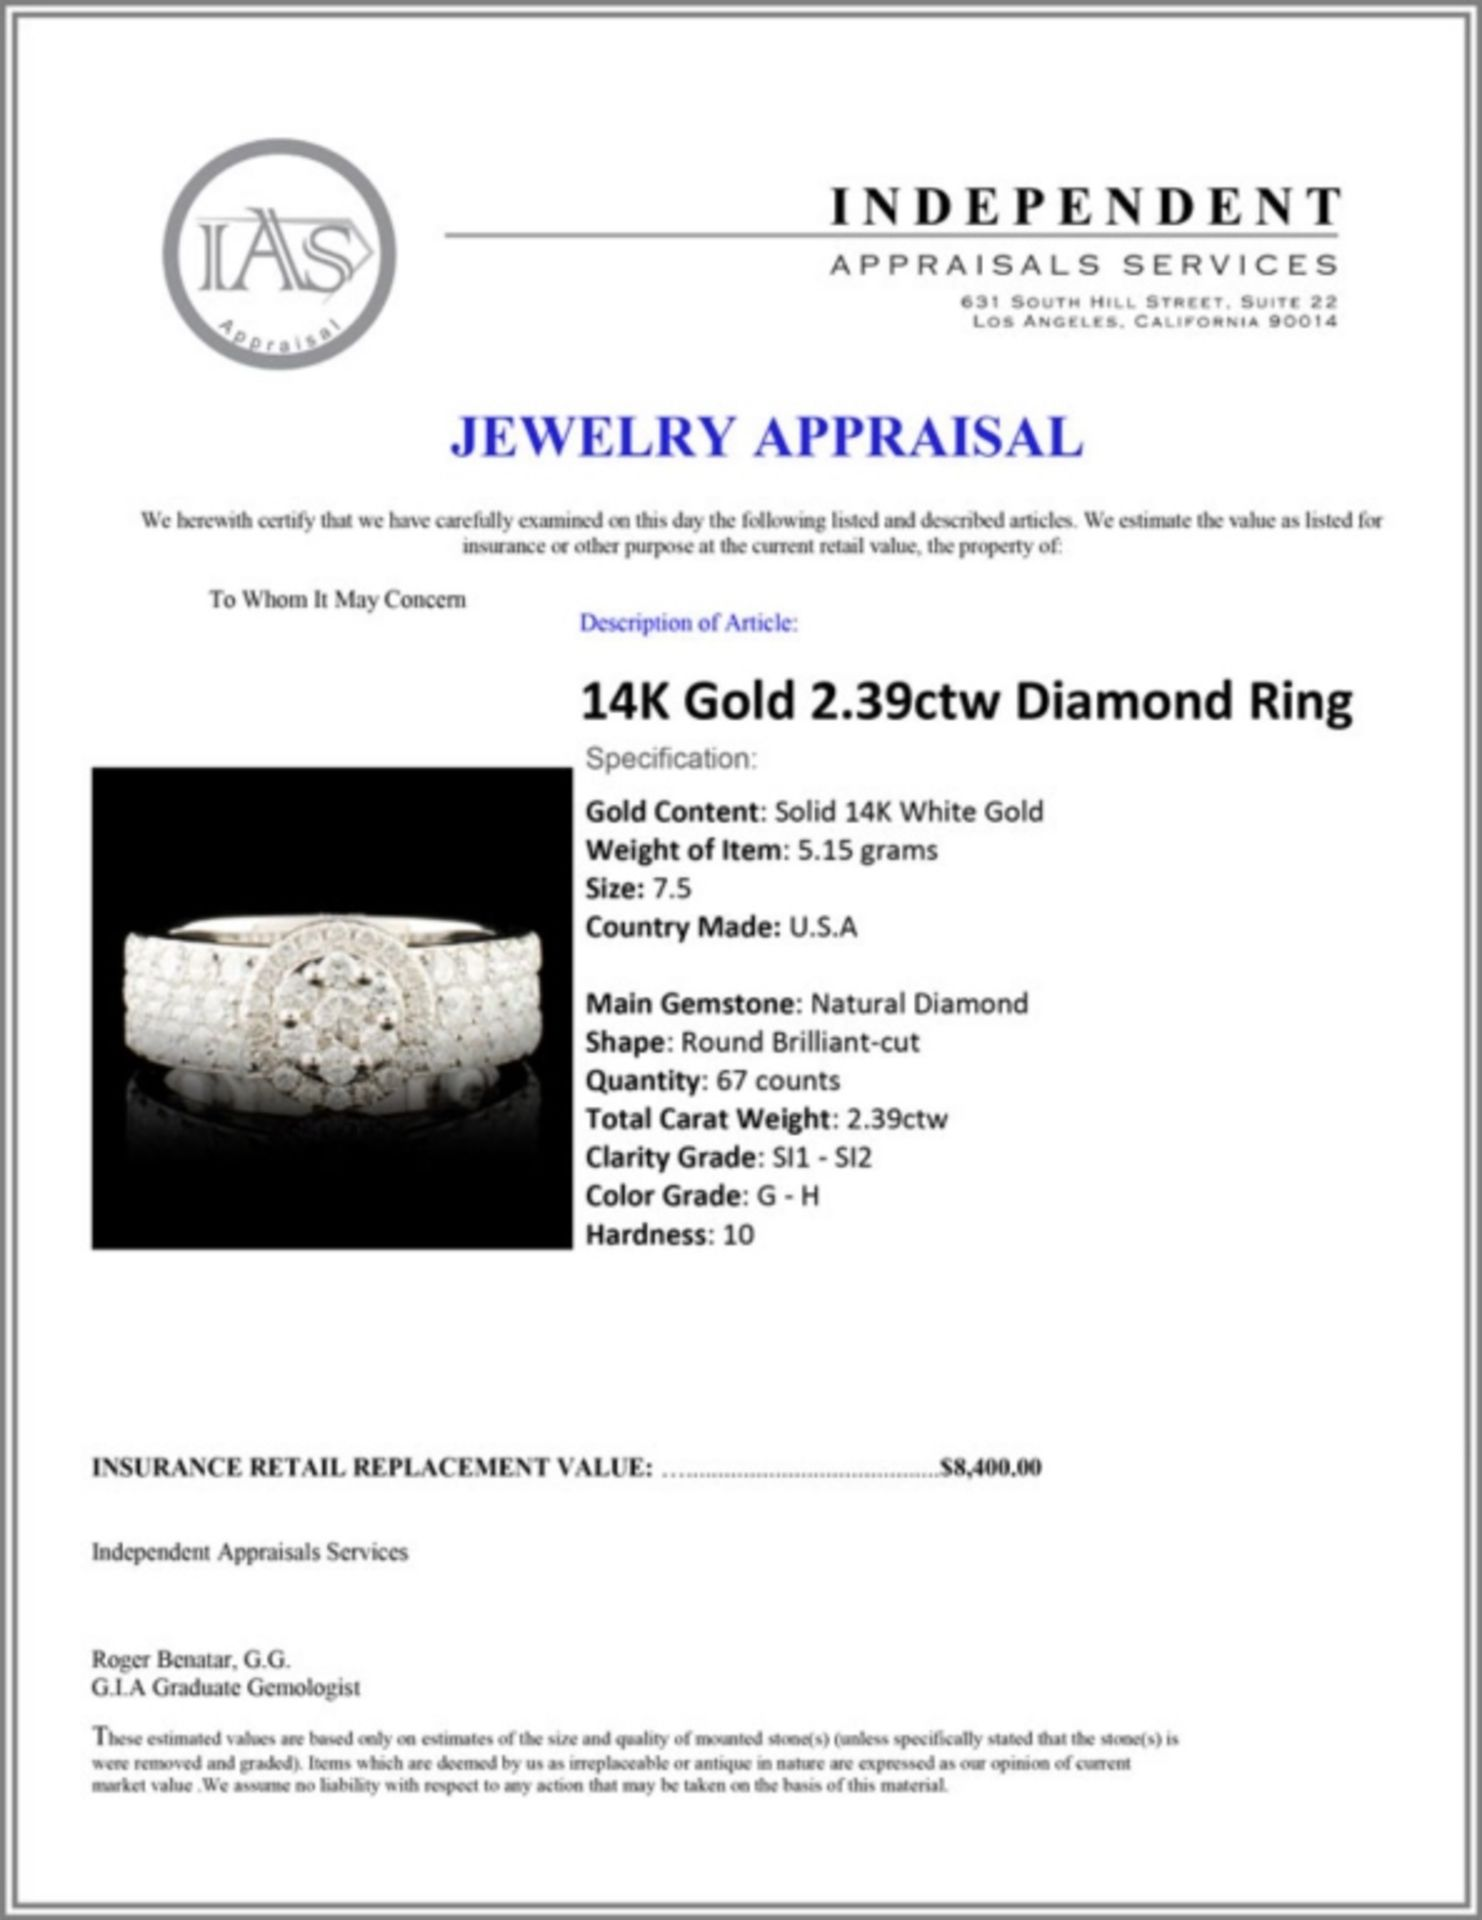 14K Gold 2.39ctw Diamond Ring - Image 5 of 5